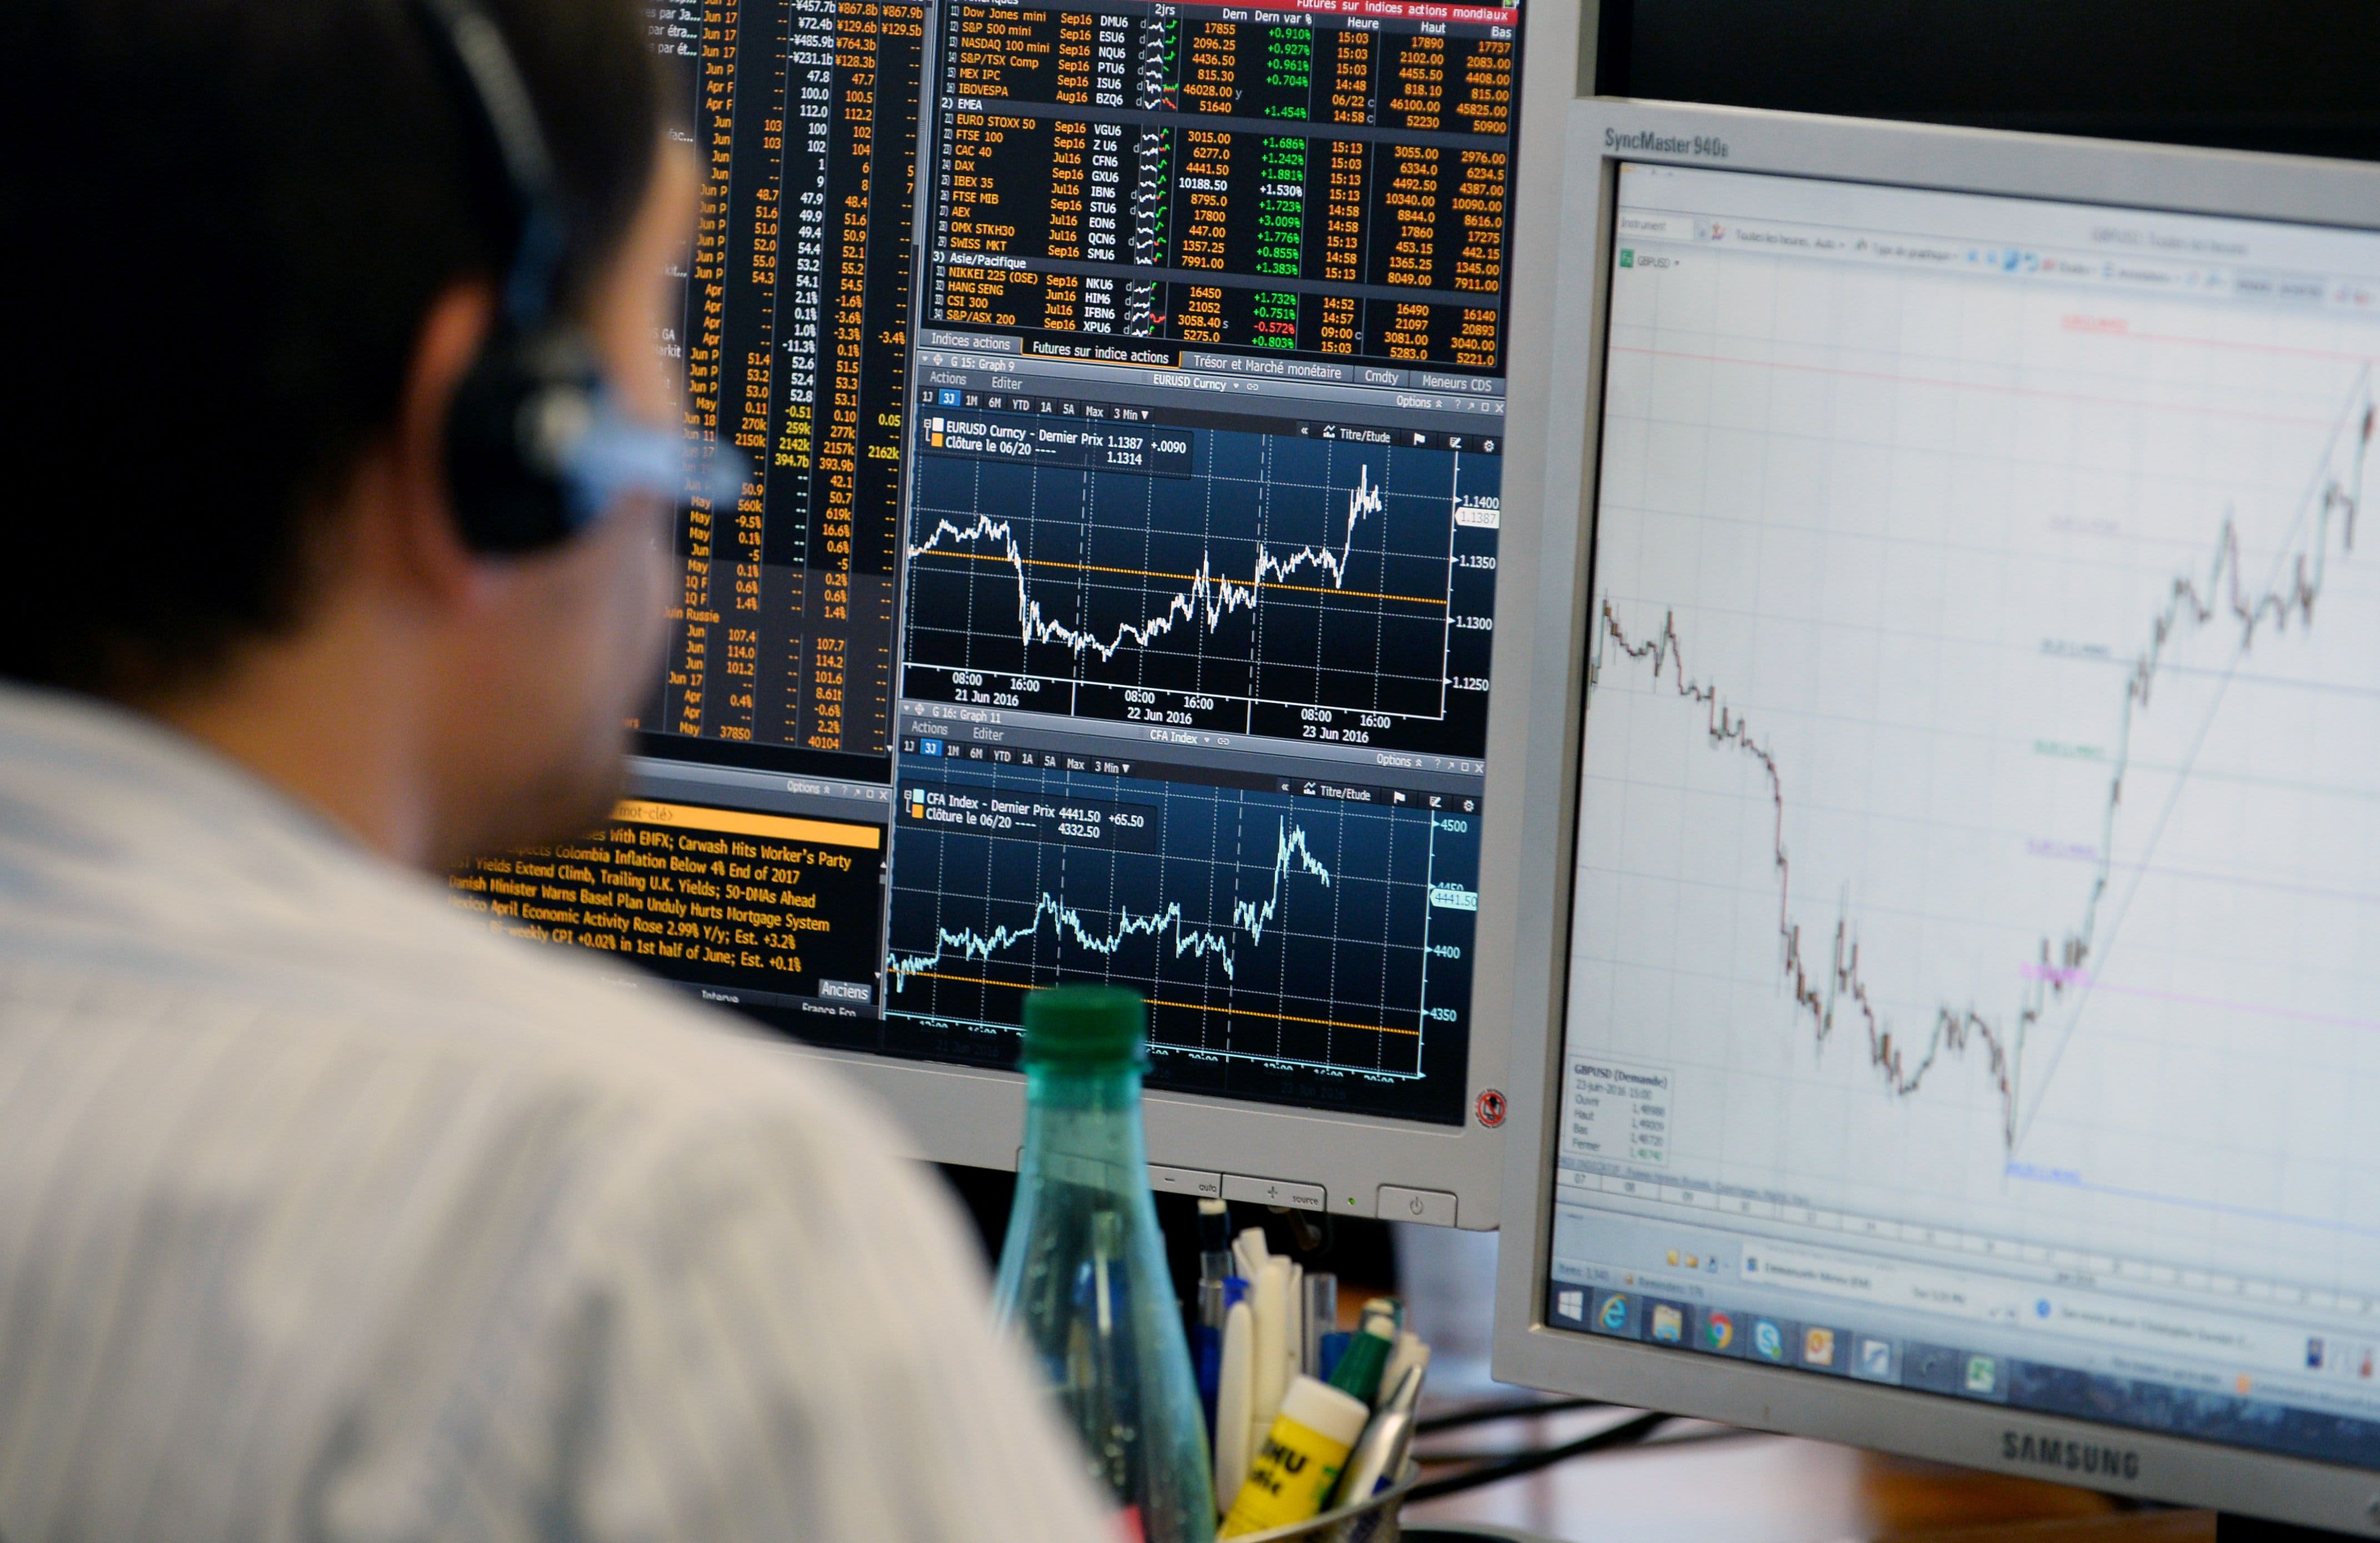 European stocks cautiously higher amid hopes US will delay EU auto tariffs; Iliad soars 18%